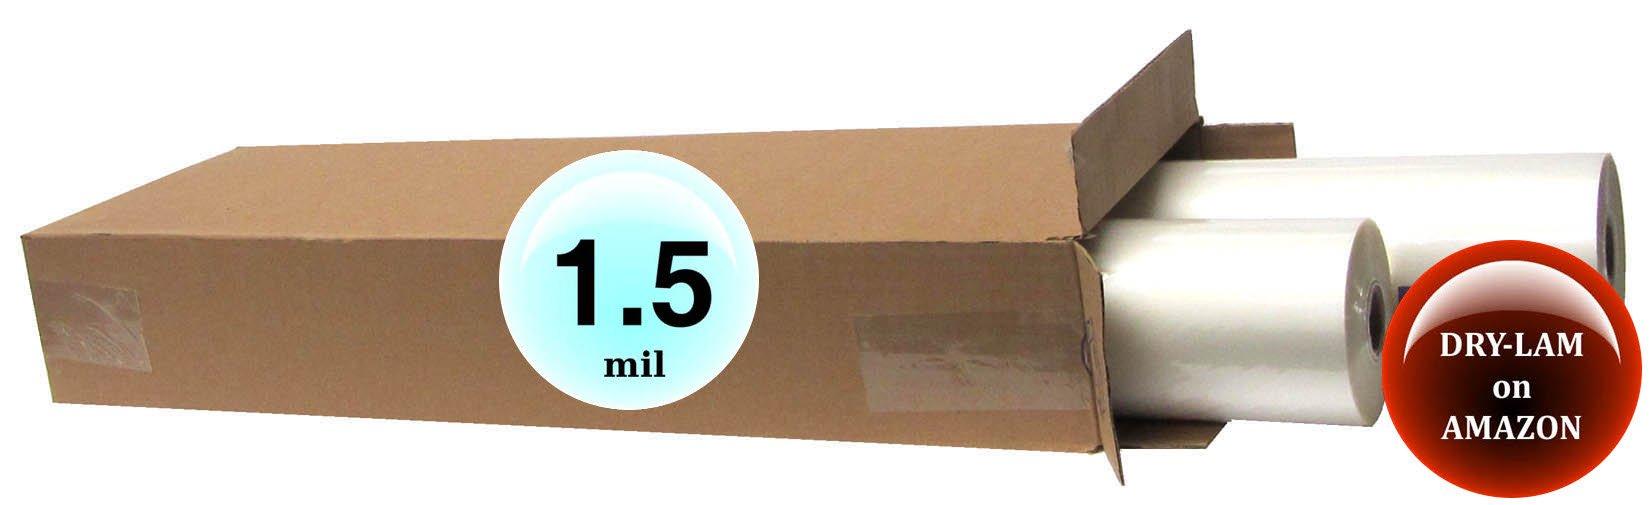 Qty 4 Rolls DRY-LAM Standard Laminating Film 25'' x 250' 1.5 Mil 1'' core by DRY-LAM Standard